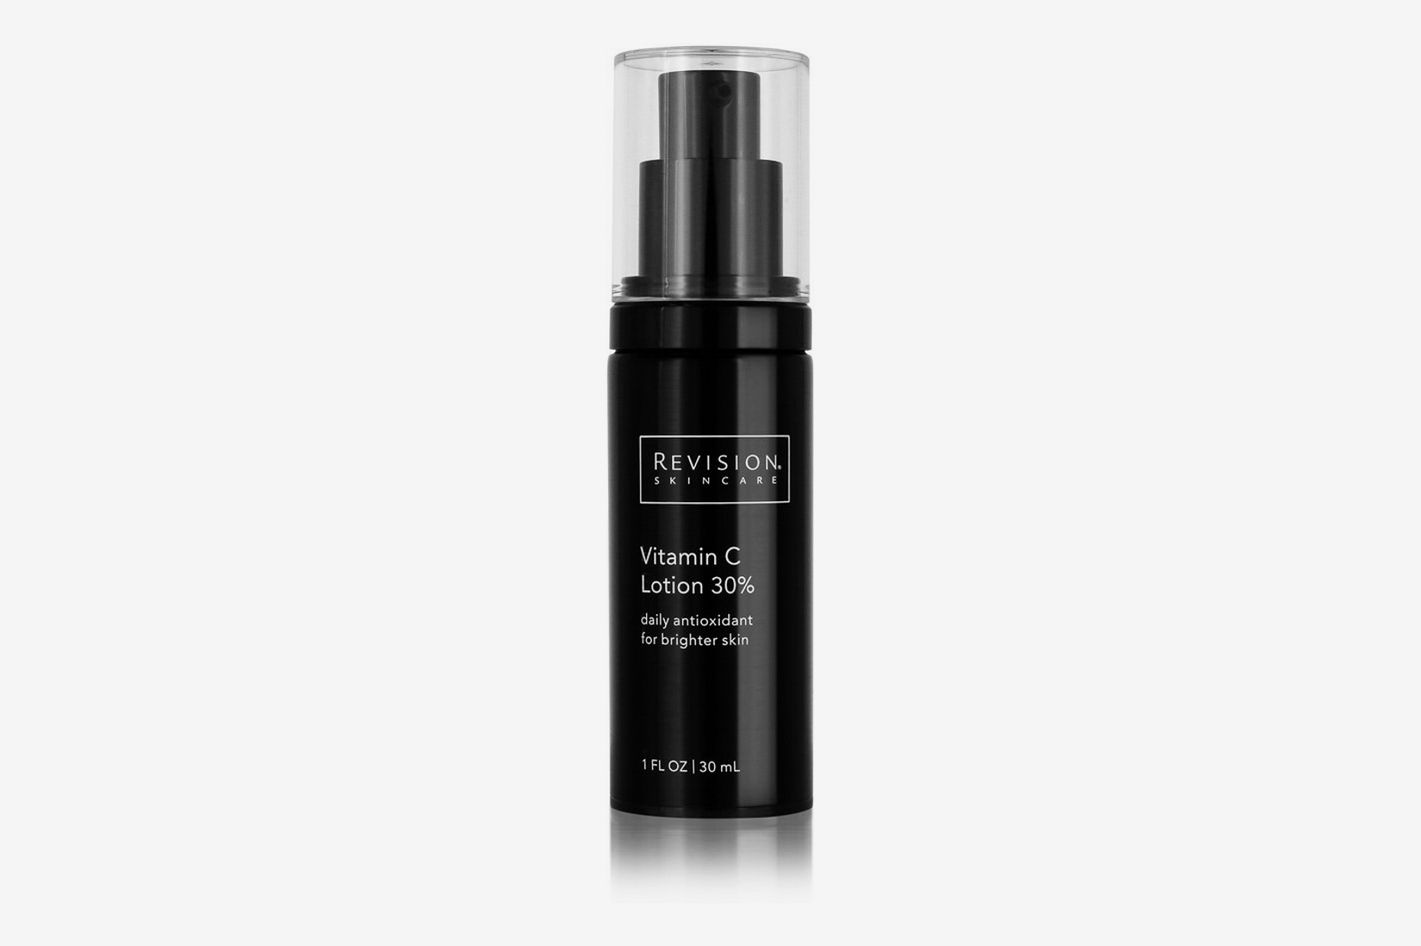 Revision Skincare Vitamin C Lotion, 30%